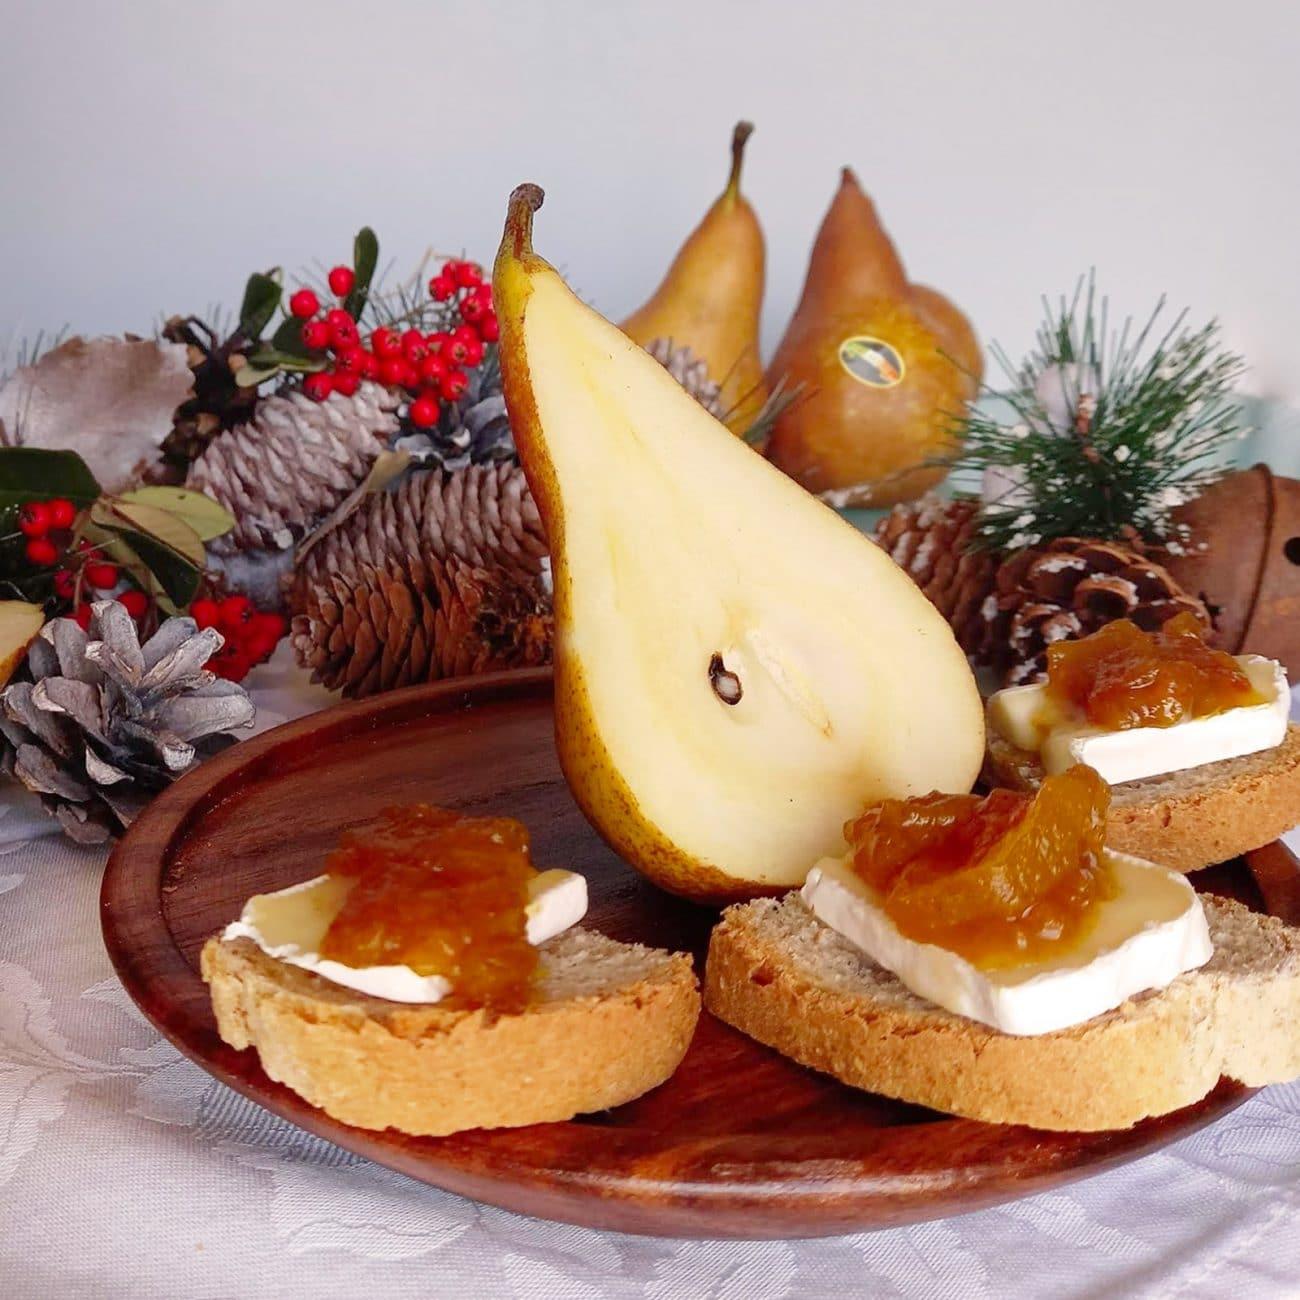 Chutney speziato di pere Kaiser Solarelli